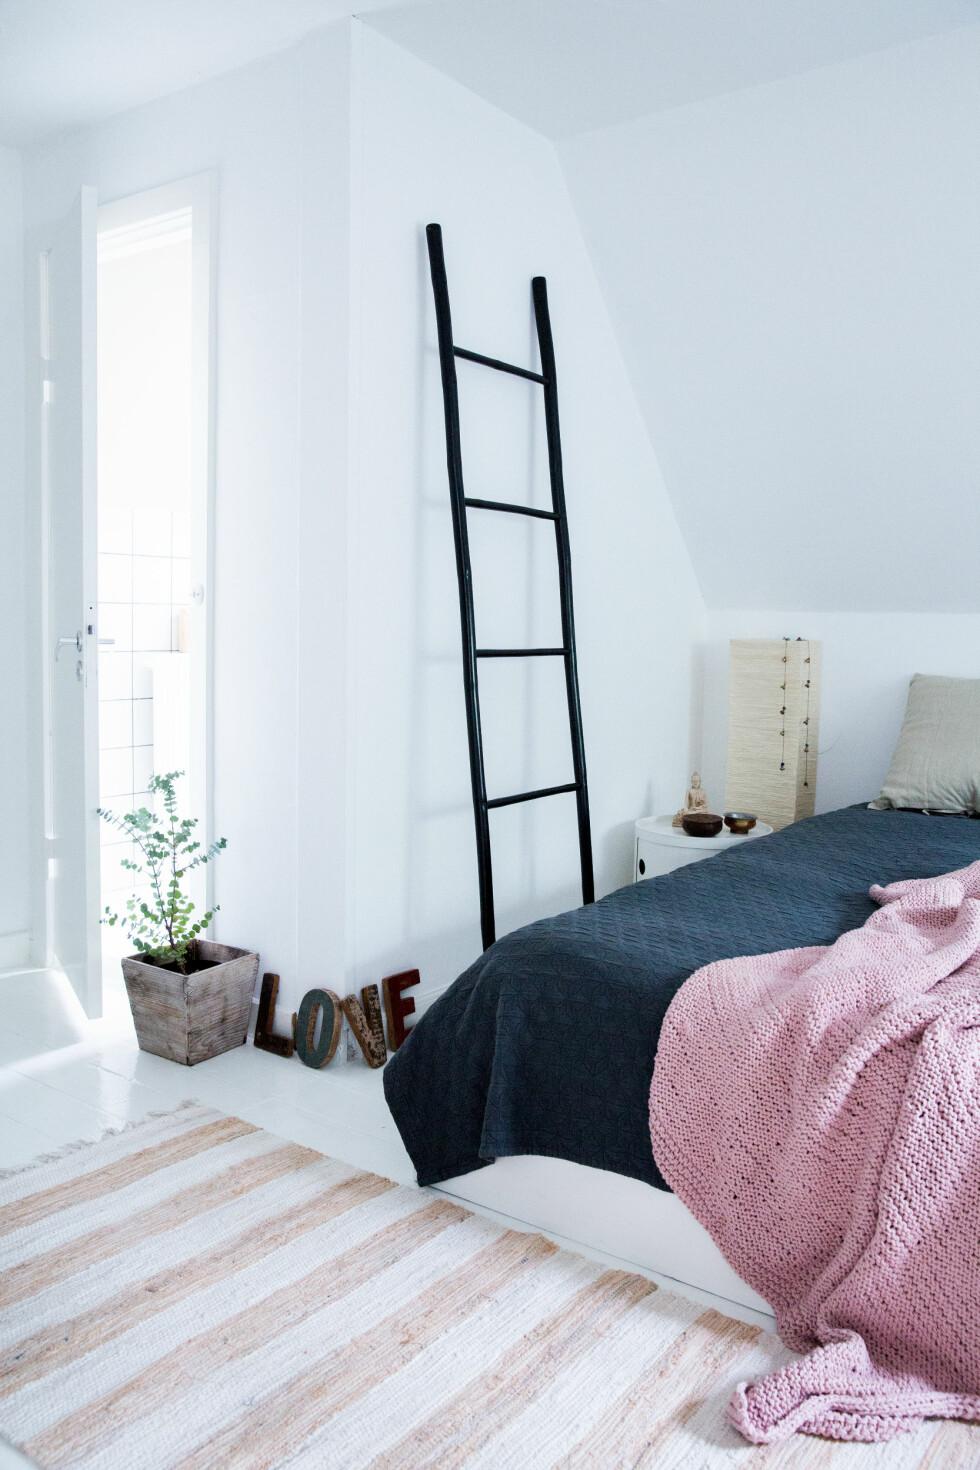 STIGE ER KULT: Det hersker en deilig zen-stemning på soverommet. Den svarte stigen er fra Broste, det samme er det gammelrosa teppet på sengen og lappeteppet på gulvet. Foto: Pernille Kaalund